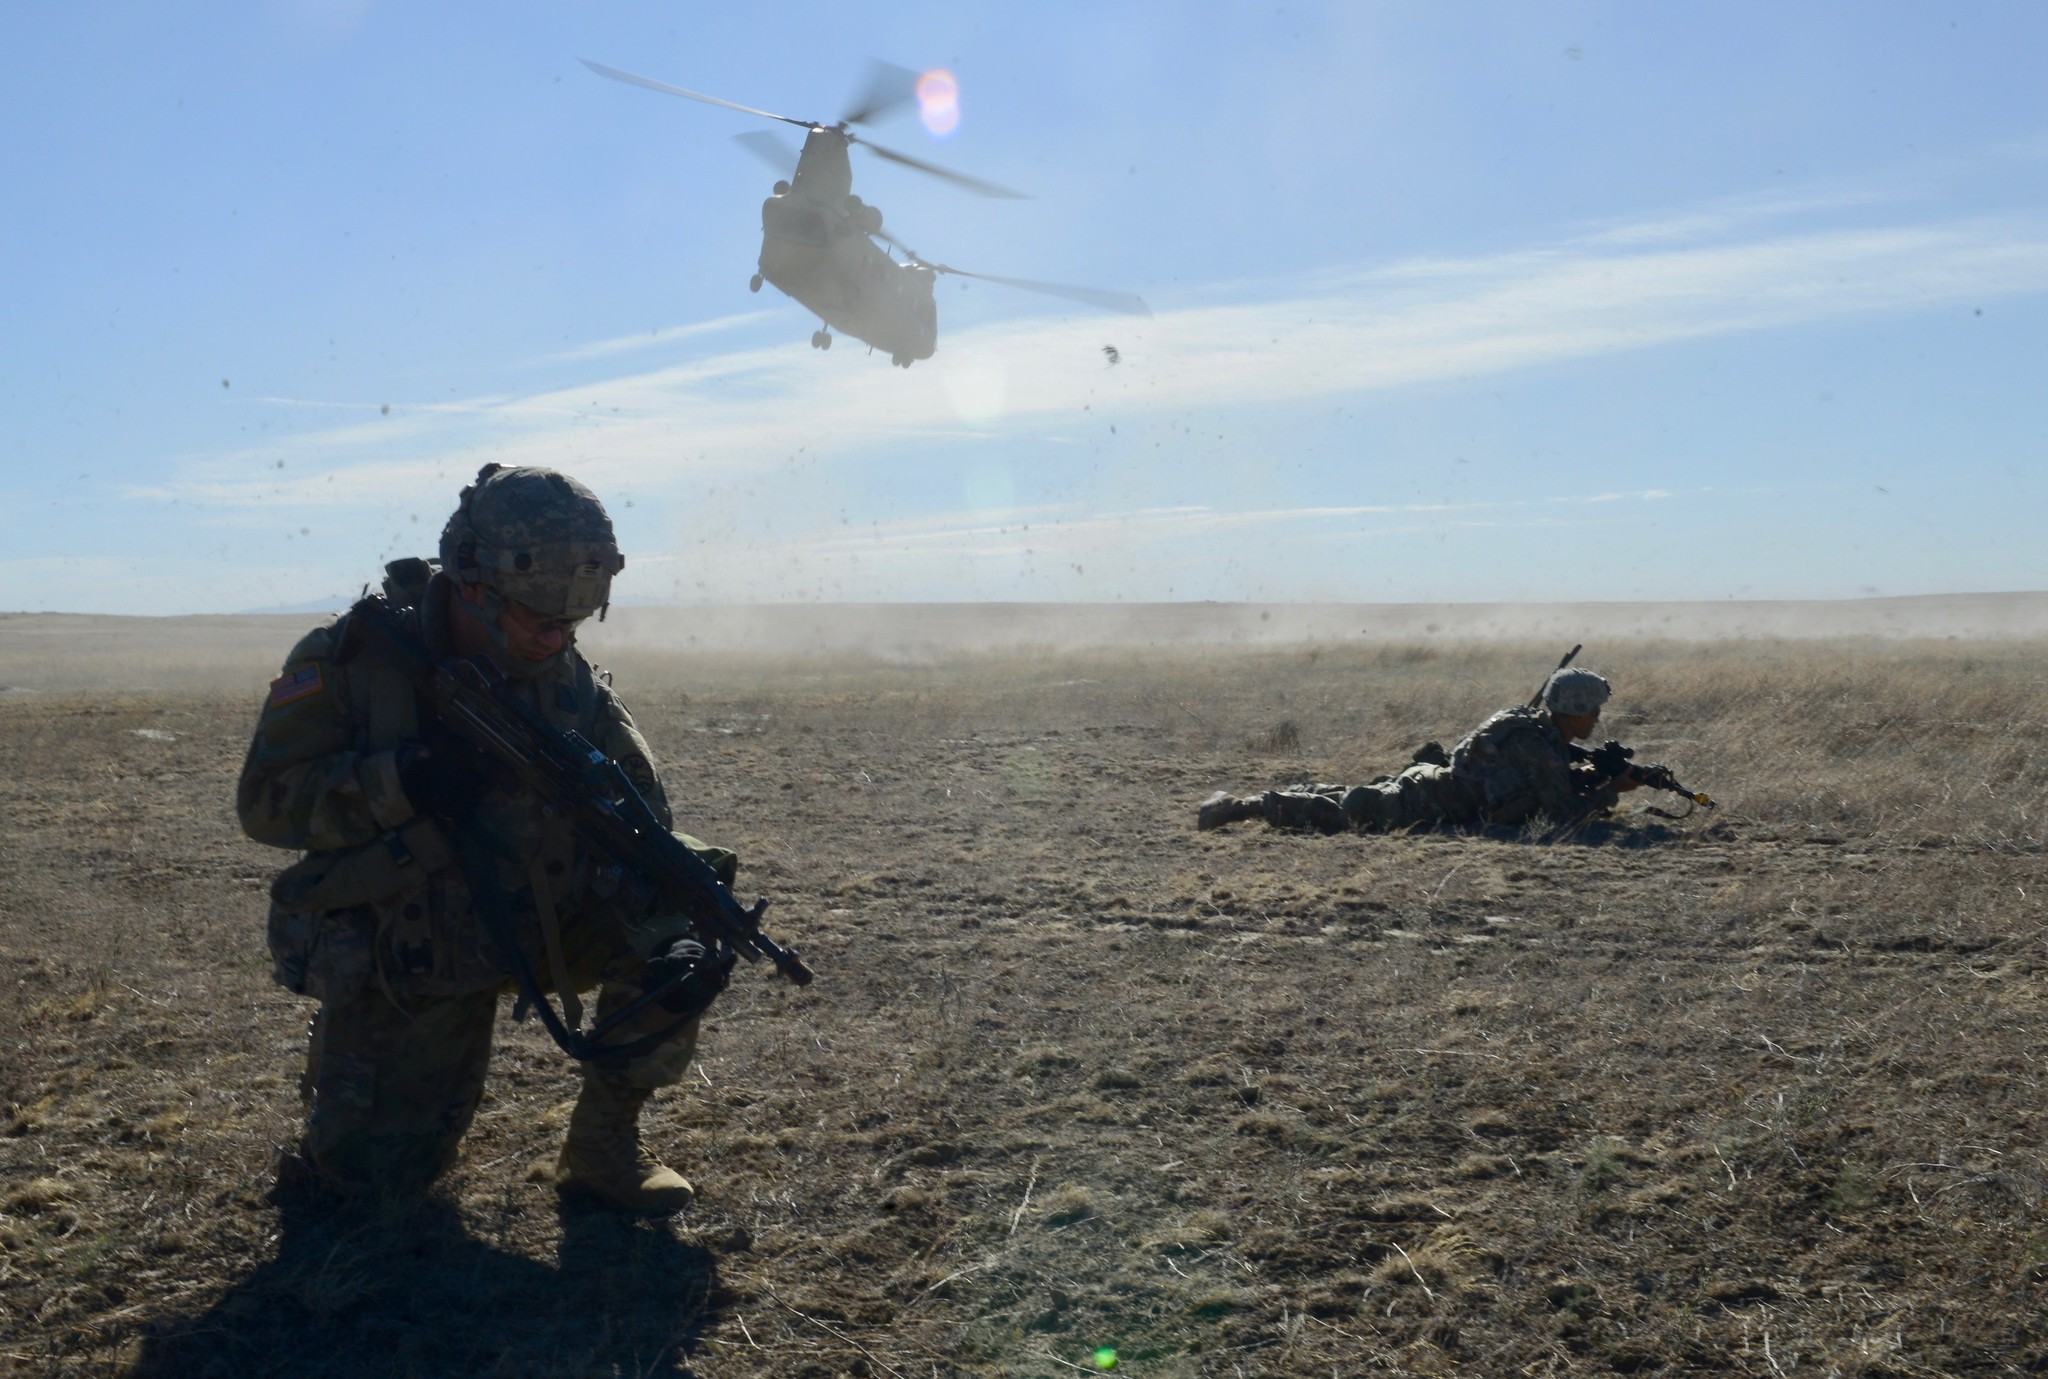 u.s. department of defense current photos | flickr